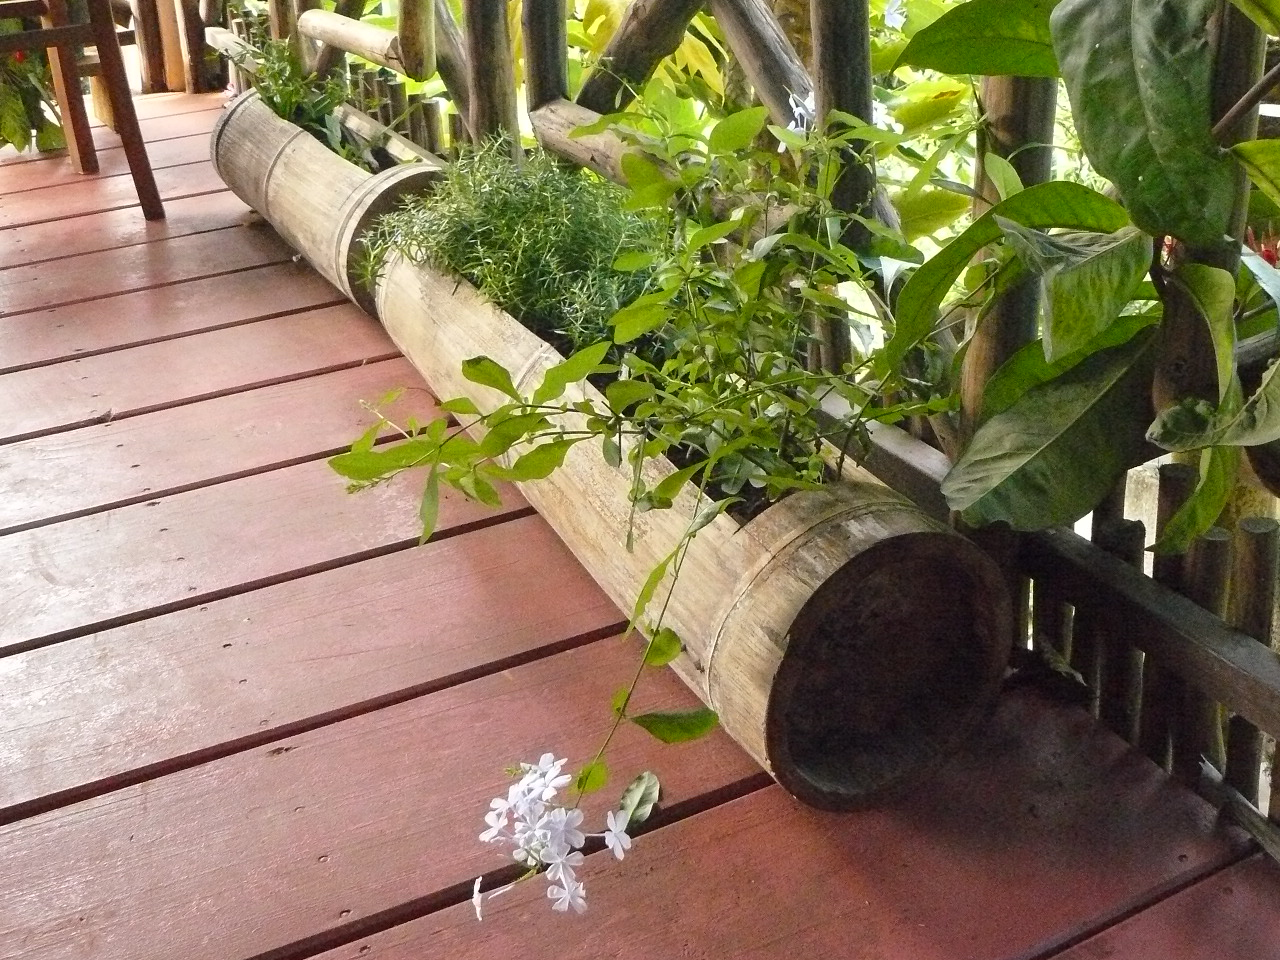 Mayotte_Combani_Relais Forestier_2